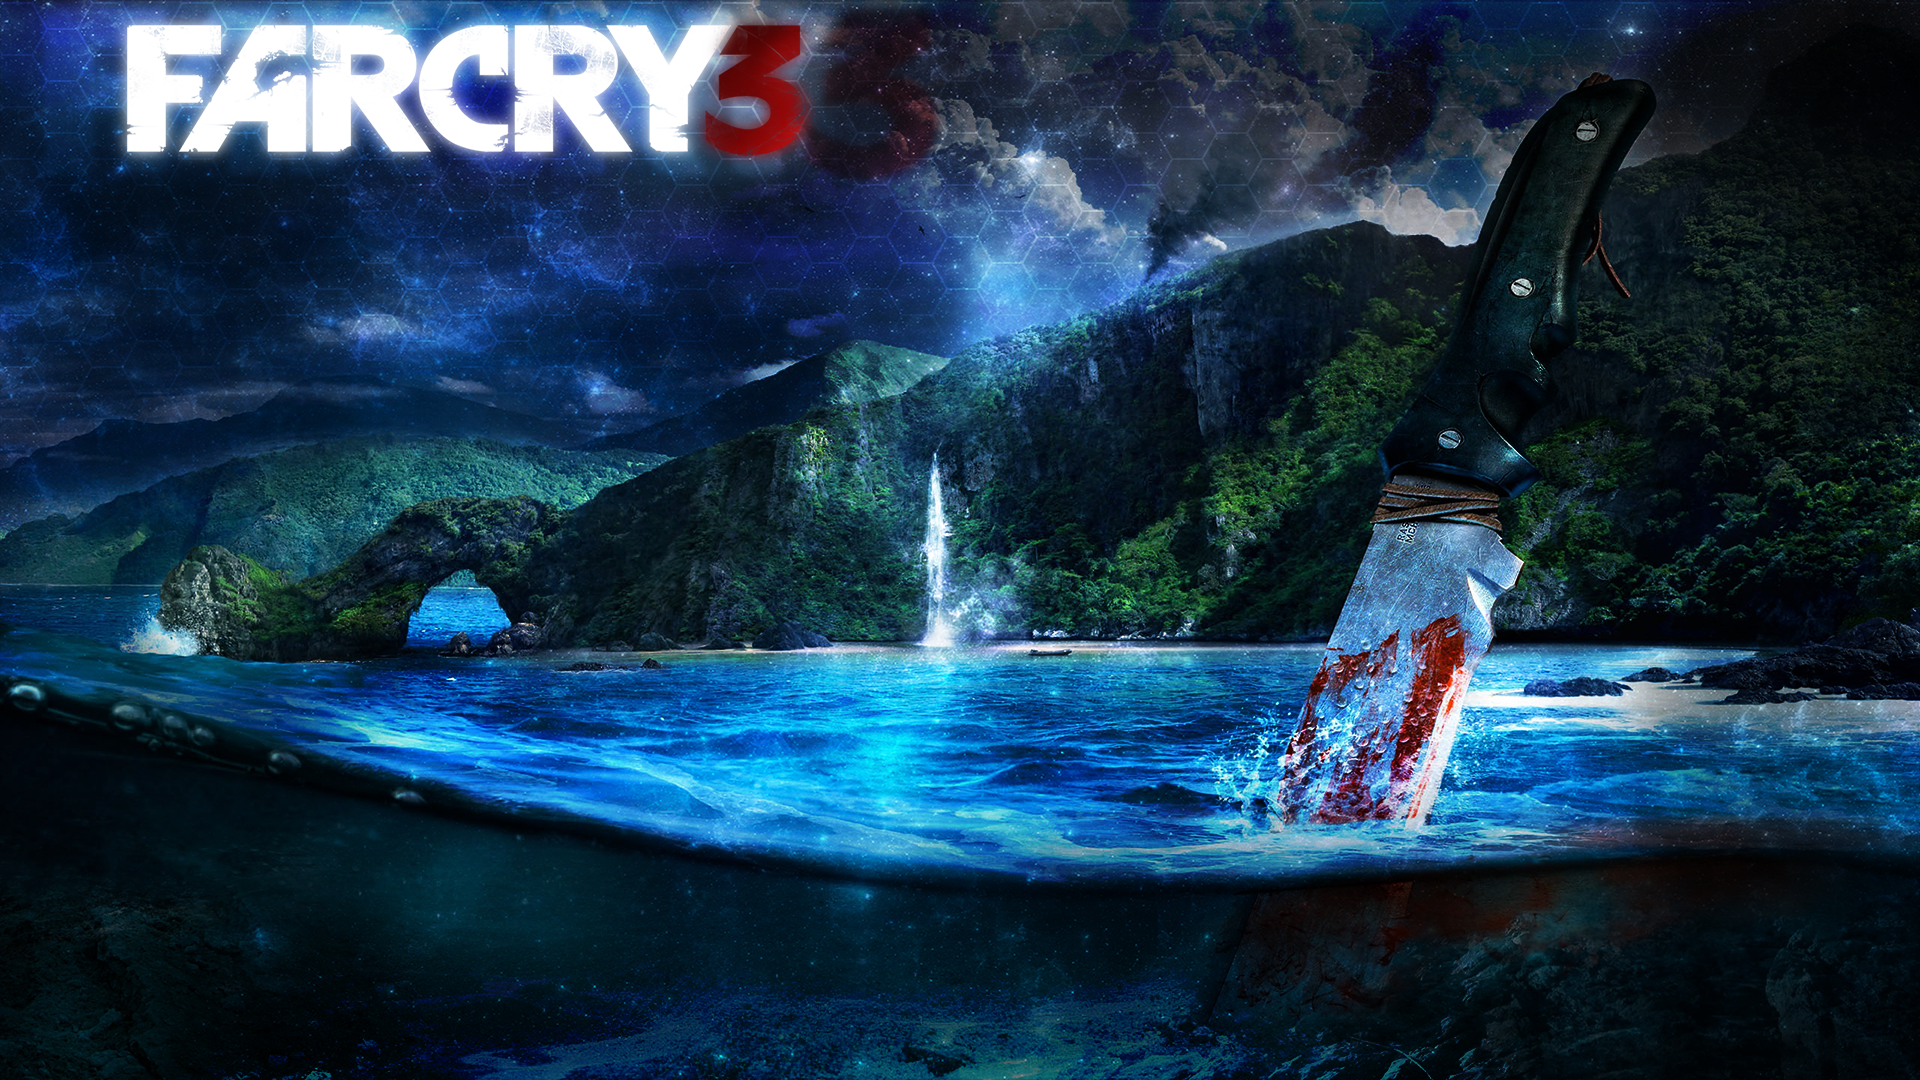 Far Cry 3 Wallpaper 1920x1080 By Forgotten5p1rit On Deviantart